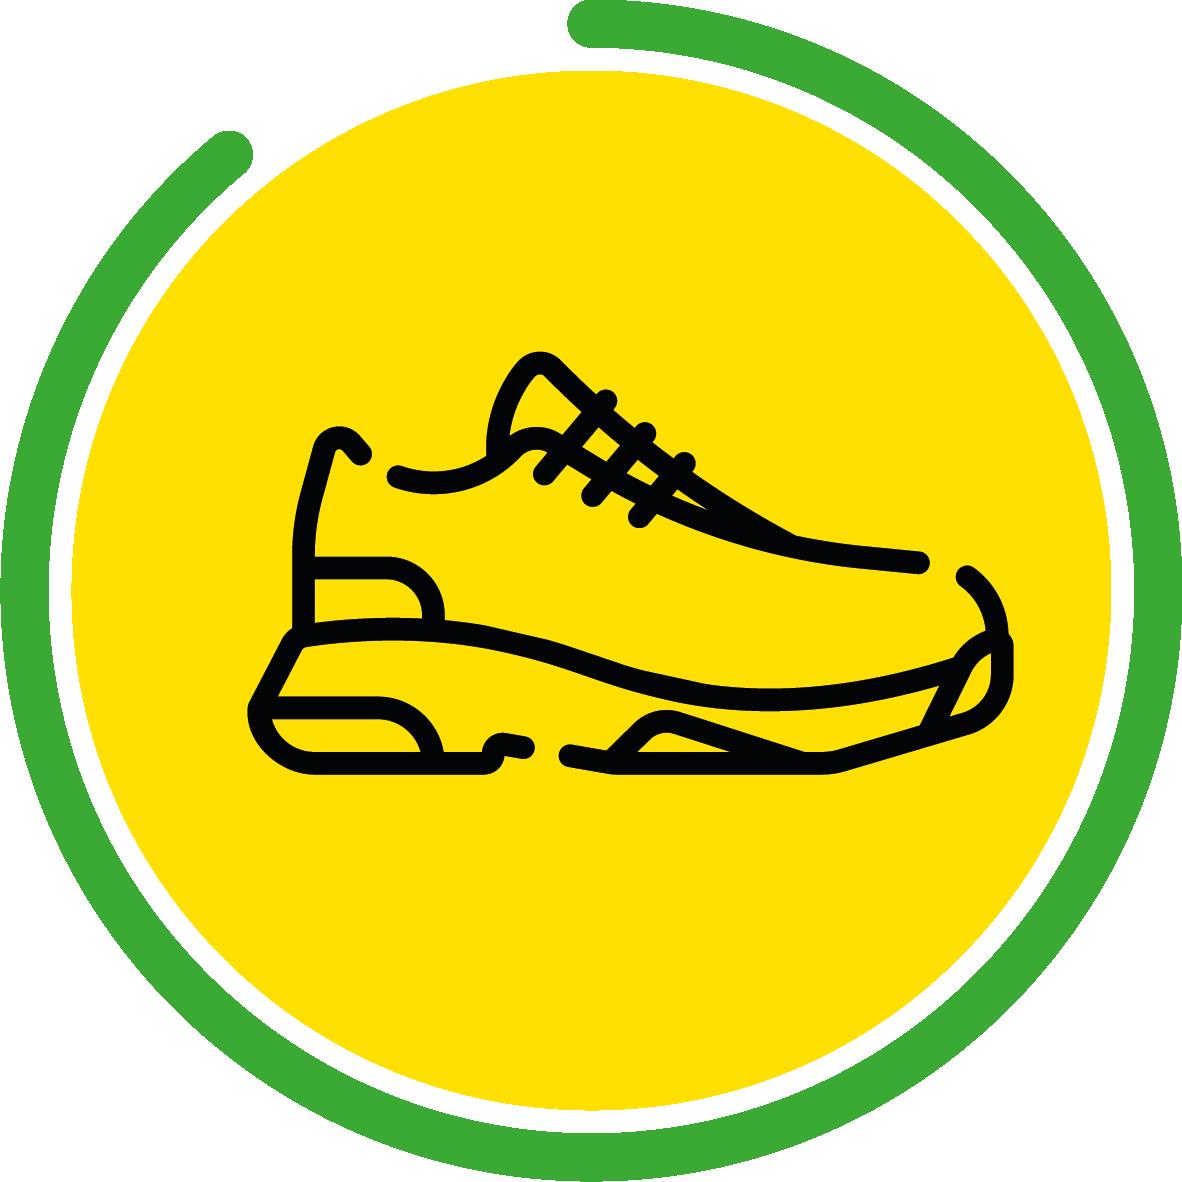 Choisir la bonne chaussure